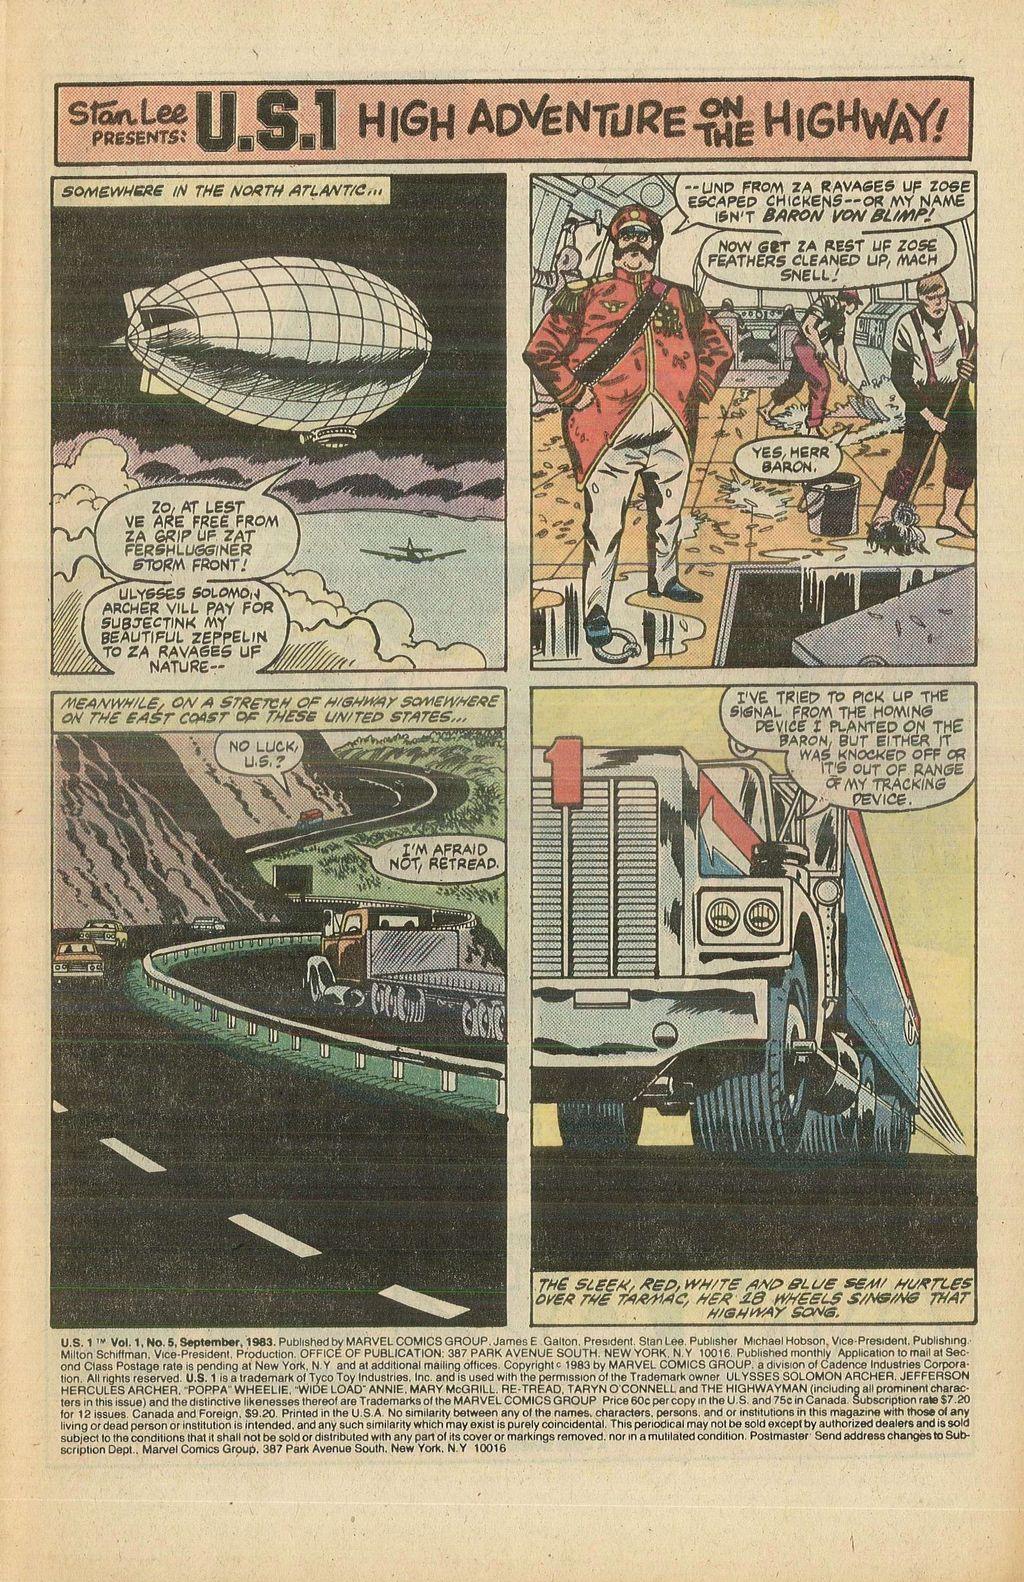 Read online U.S. 1 comic -  Issue #5 - 3